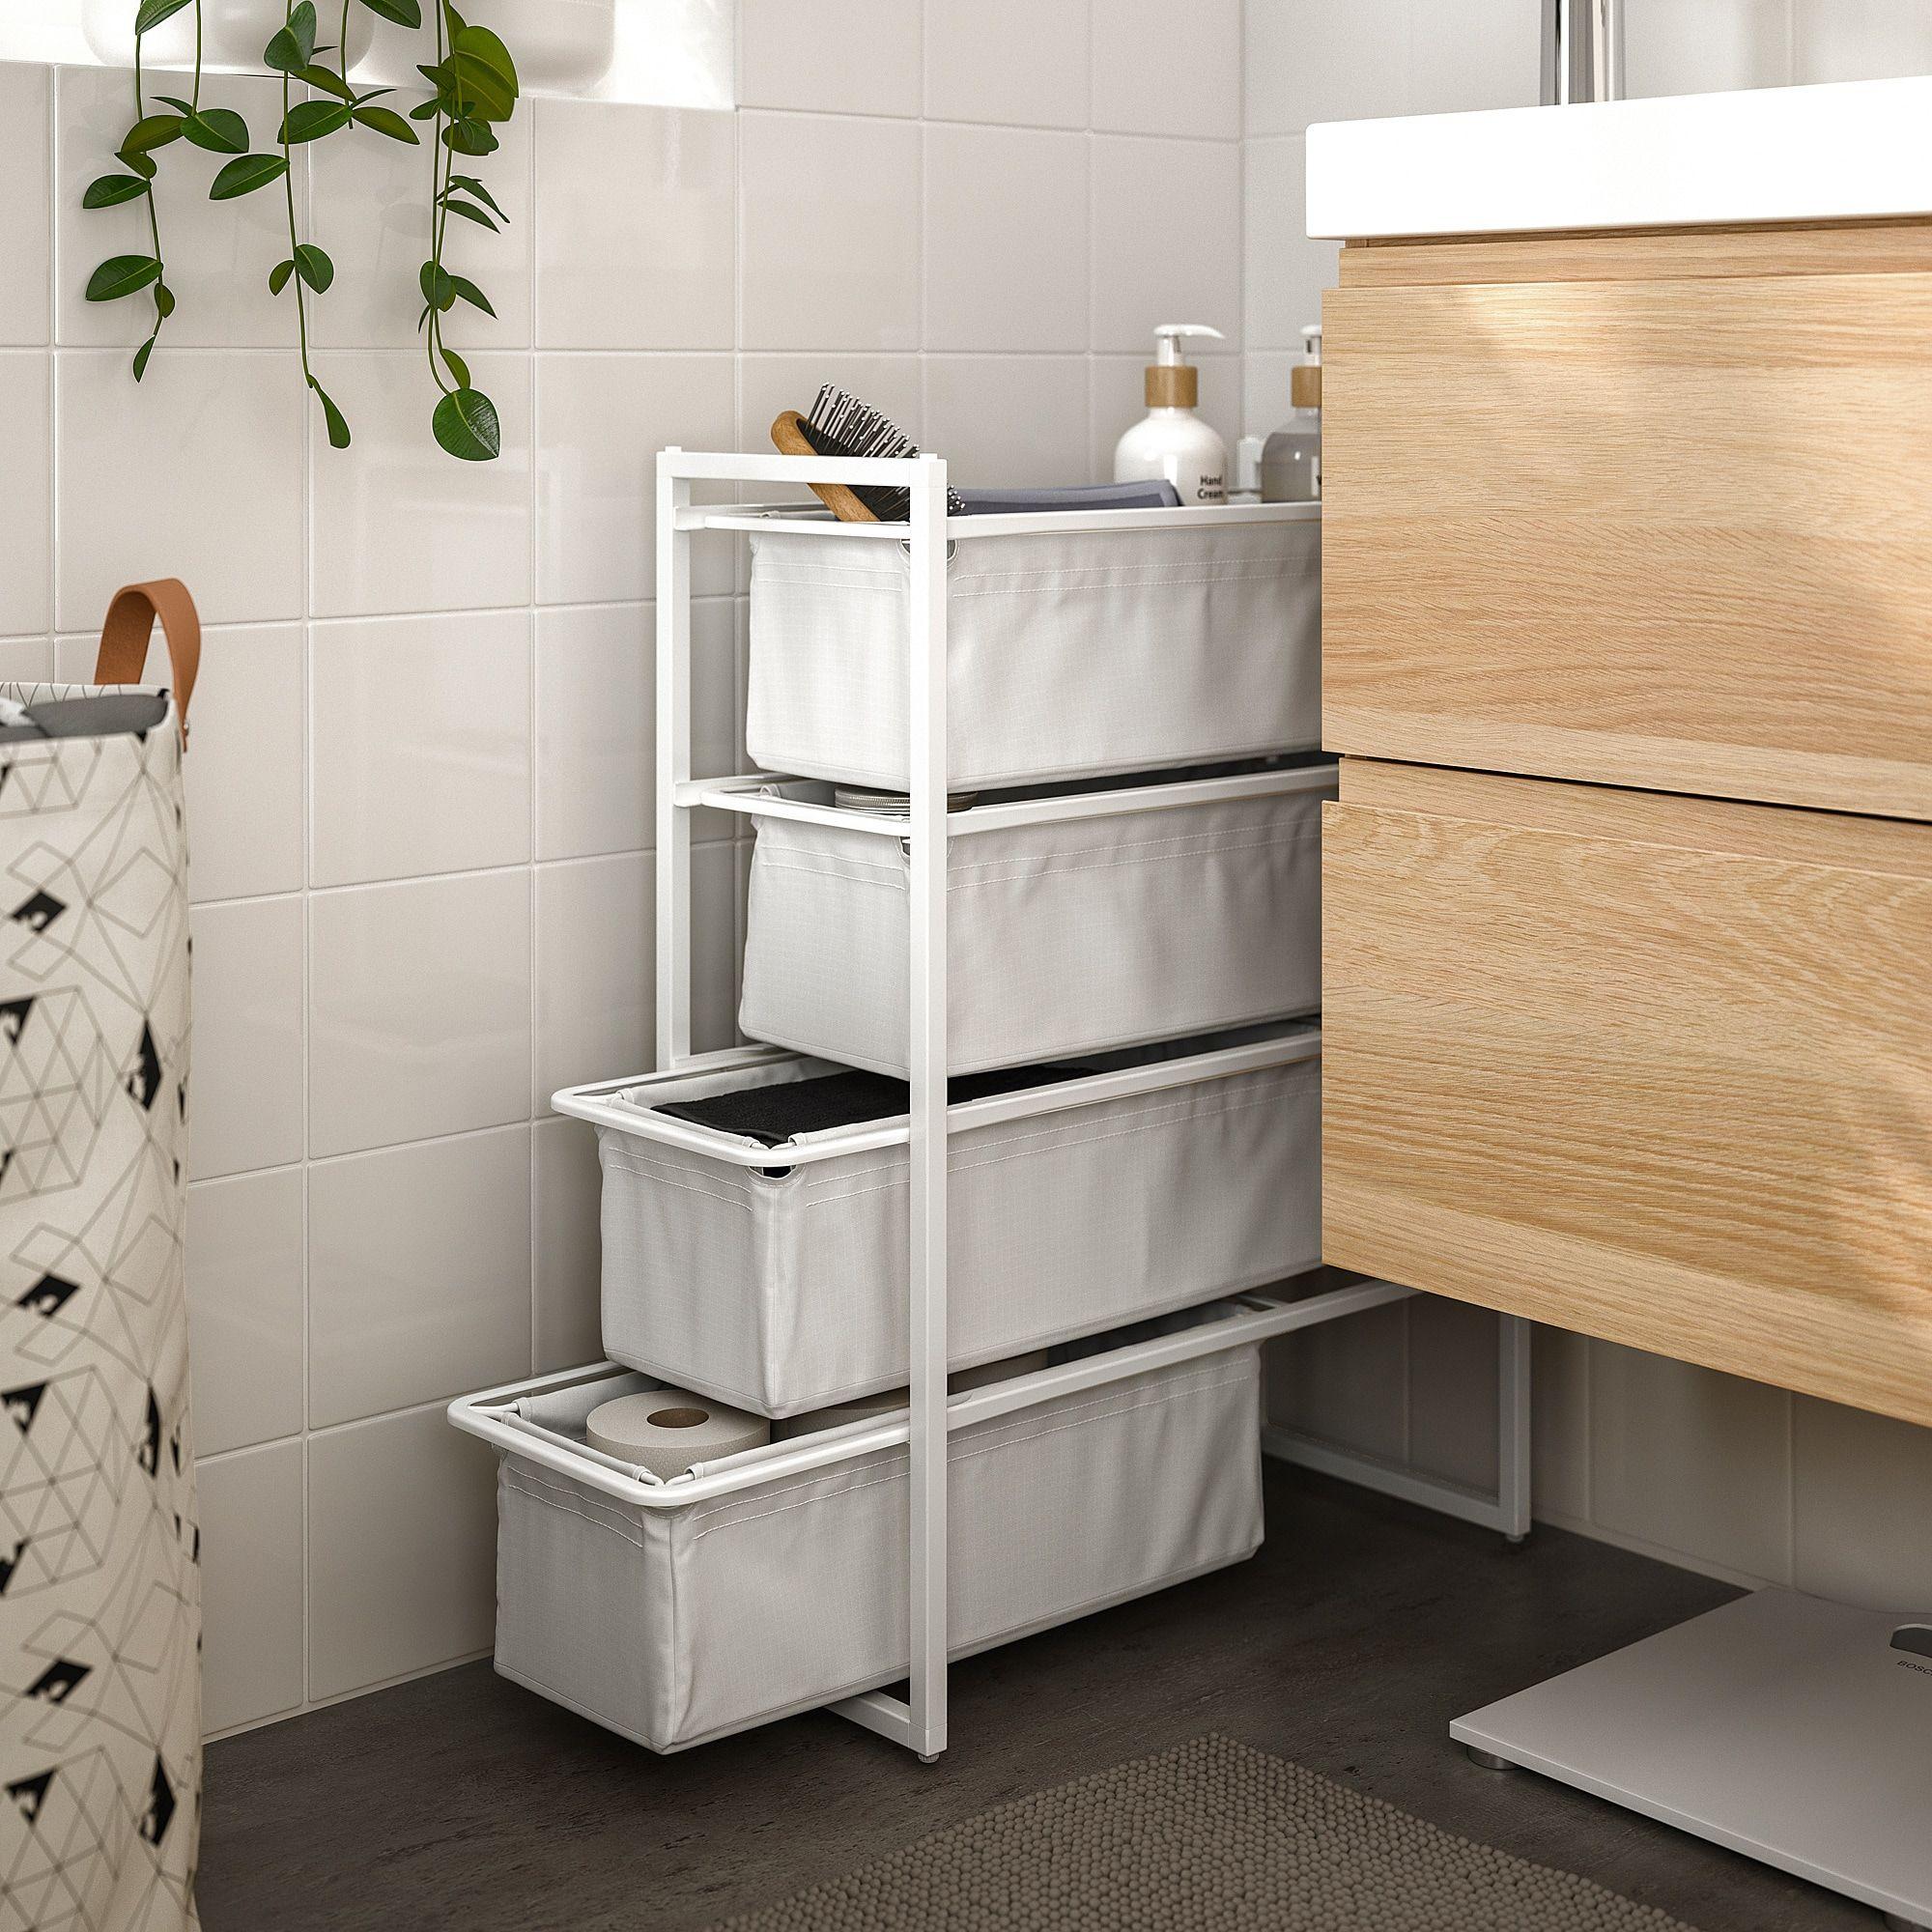 Jonaxel Rahmen Mit Stoffkorben Ikea Osterreich Ikea Ikea Hack Bathroom Storage Hacks Bedroom